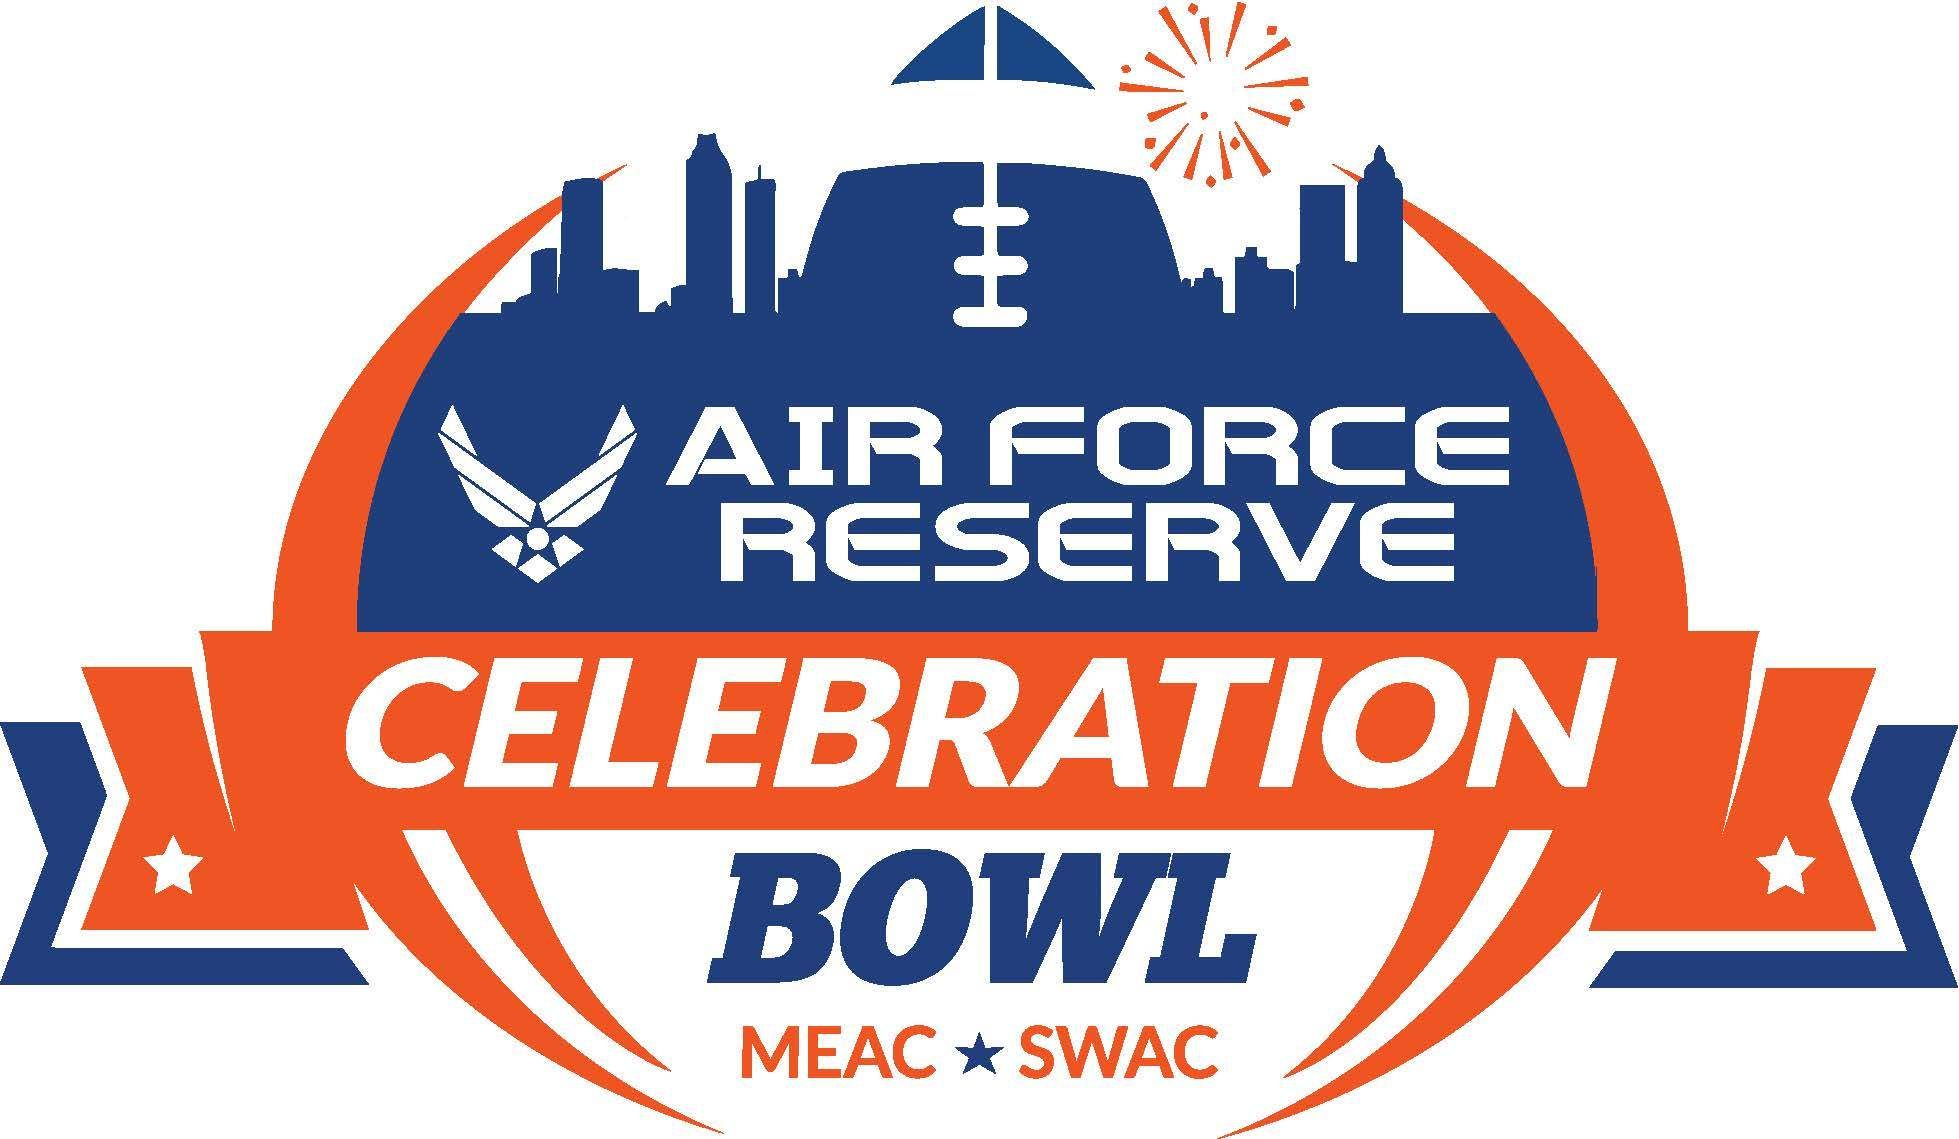 Celebration Bowl HBCU Football, Holiday Fun and Family